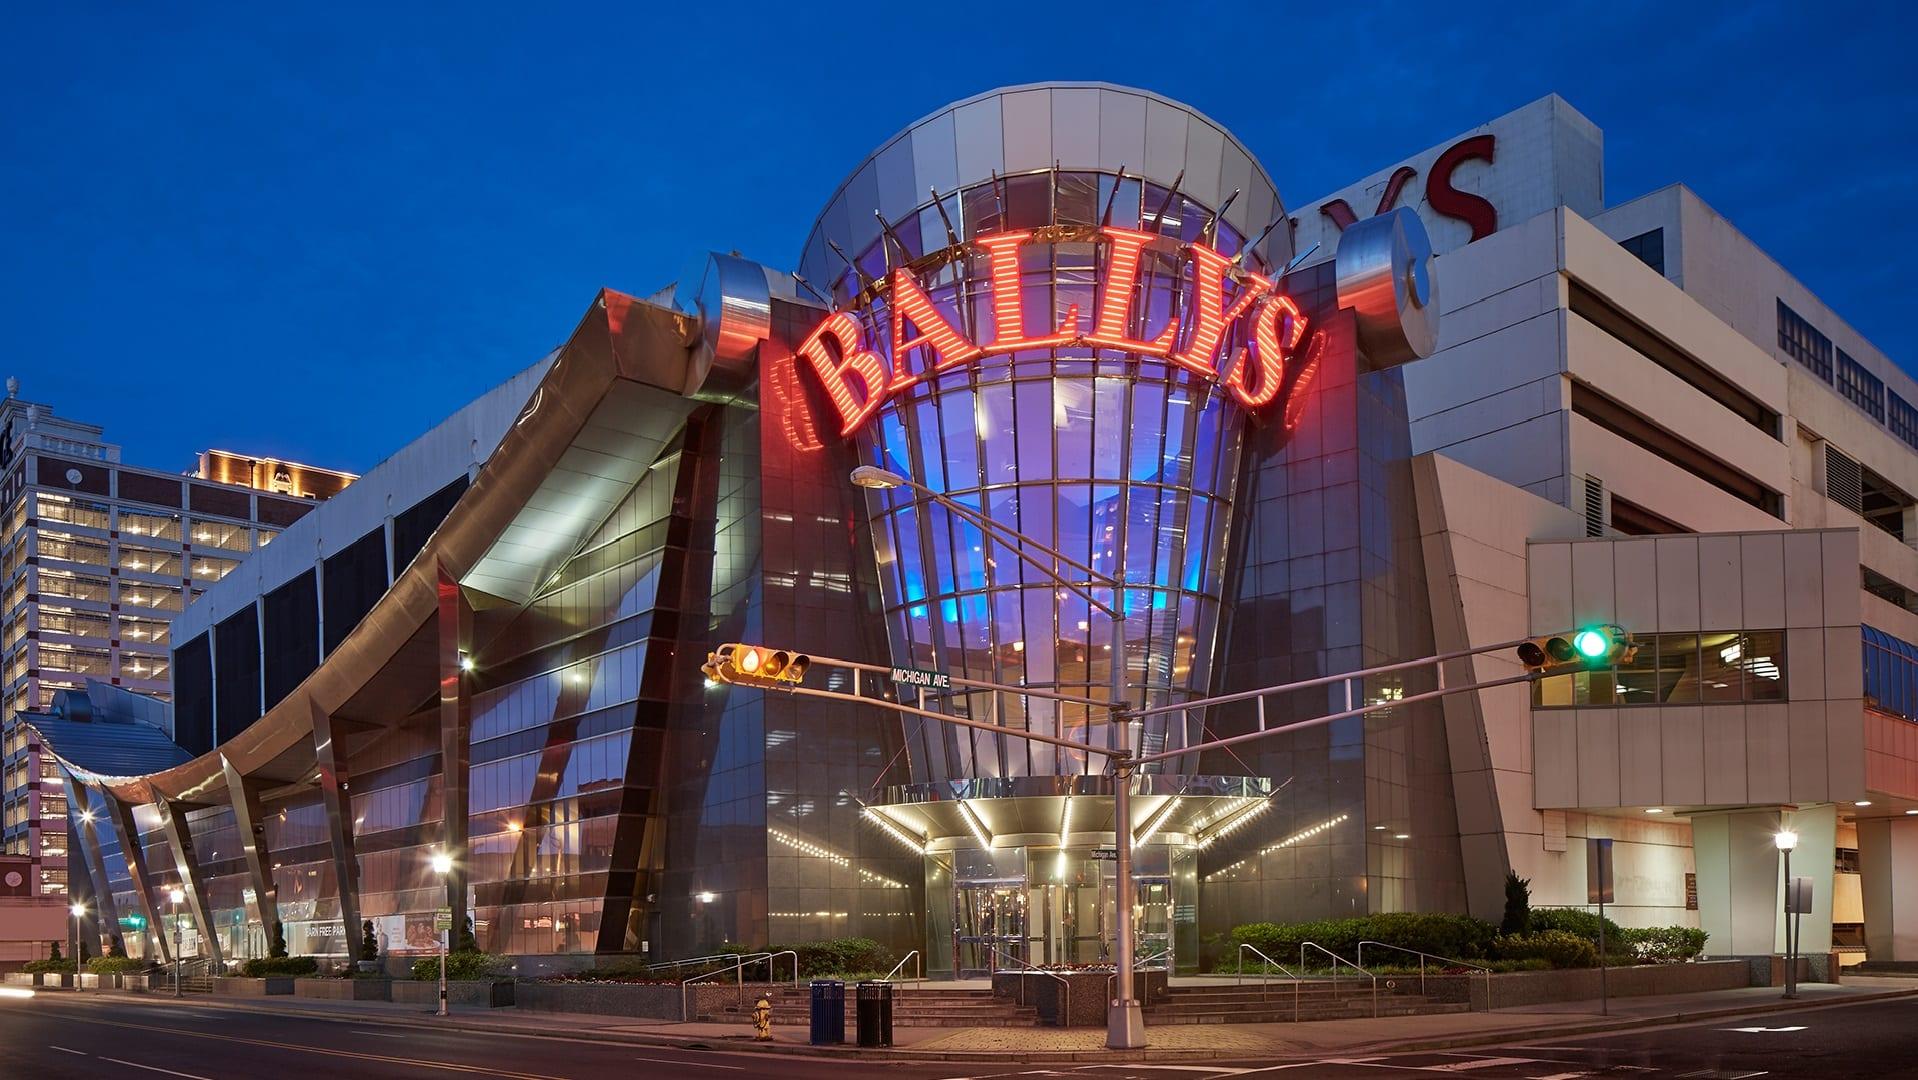 NJ Casino Trips - Bally's Casino - LI Casino Transportation